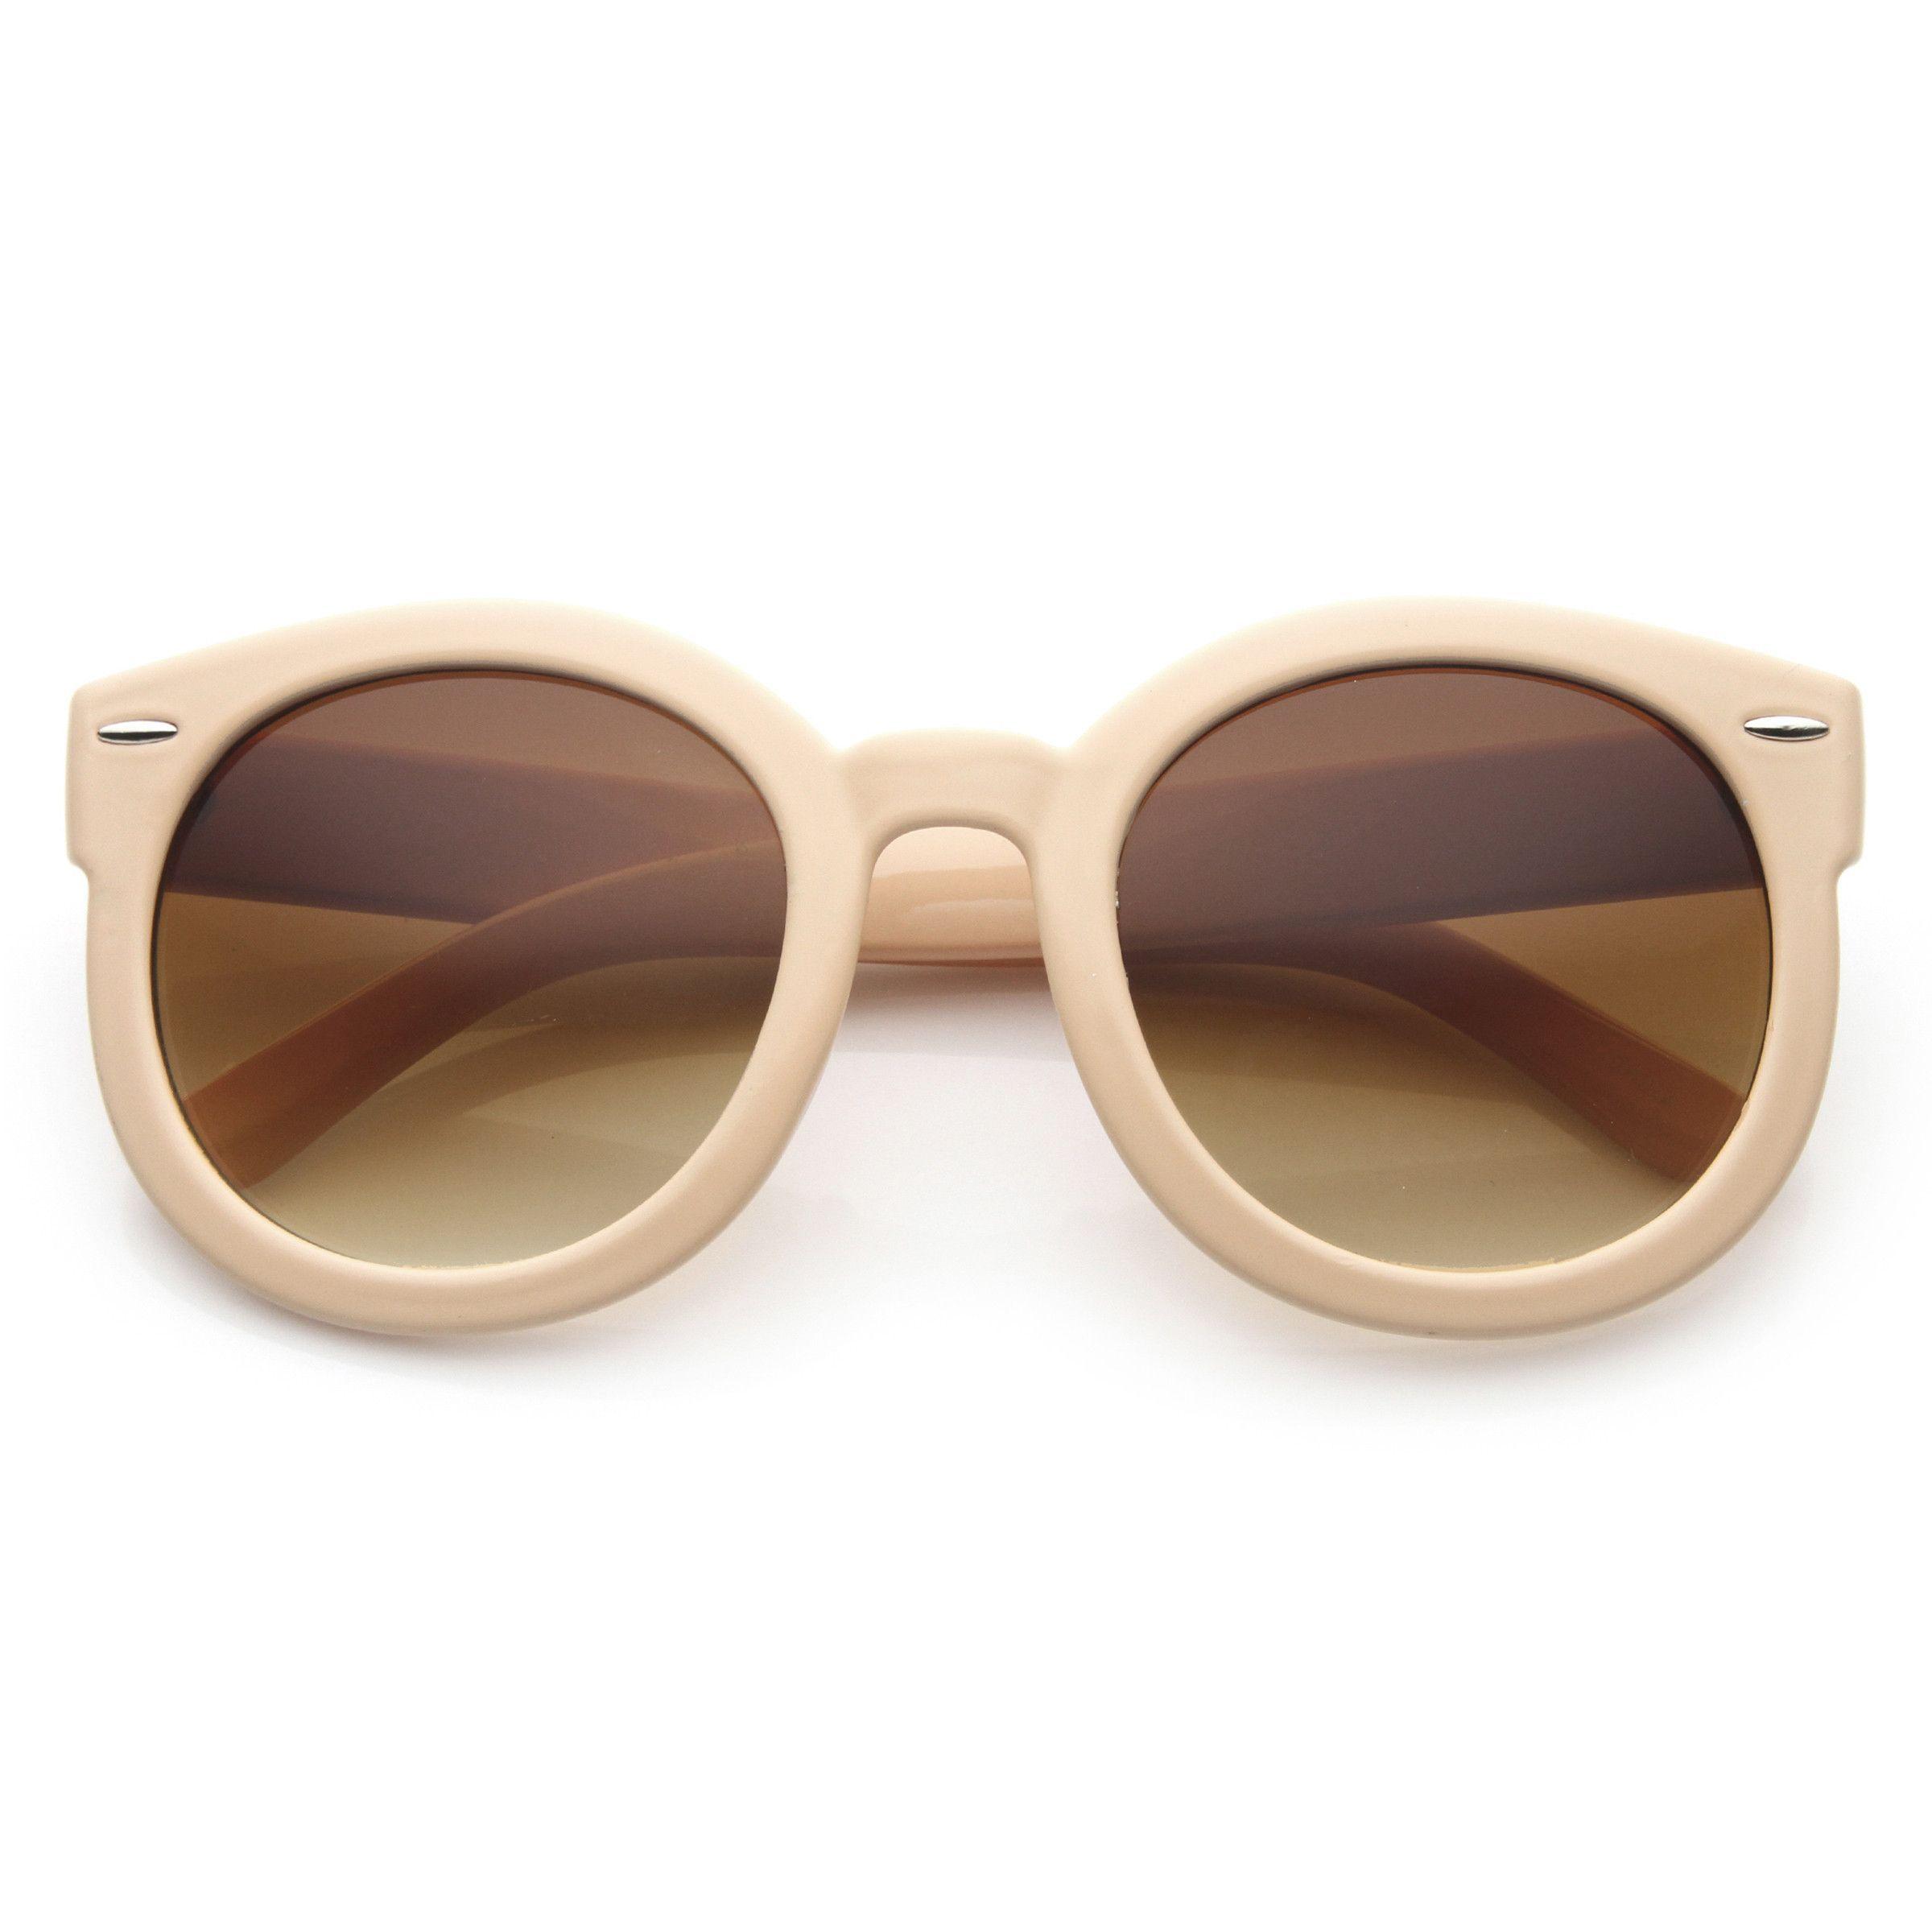 43725ddfbf49 Womens Plastic Sunglasses Oversized Retro Style with Metal Rivets ...